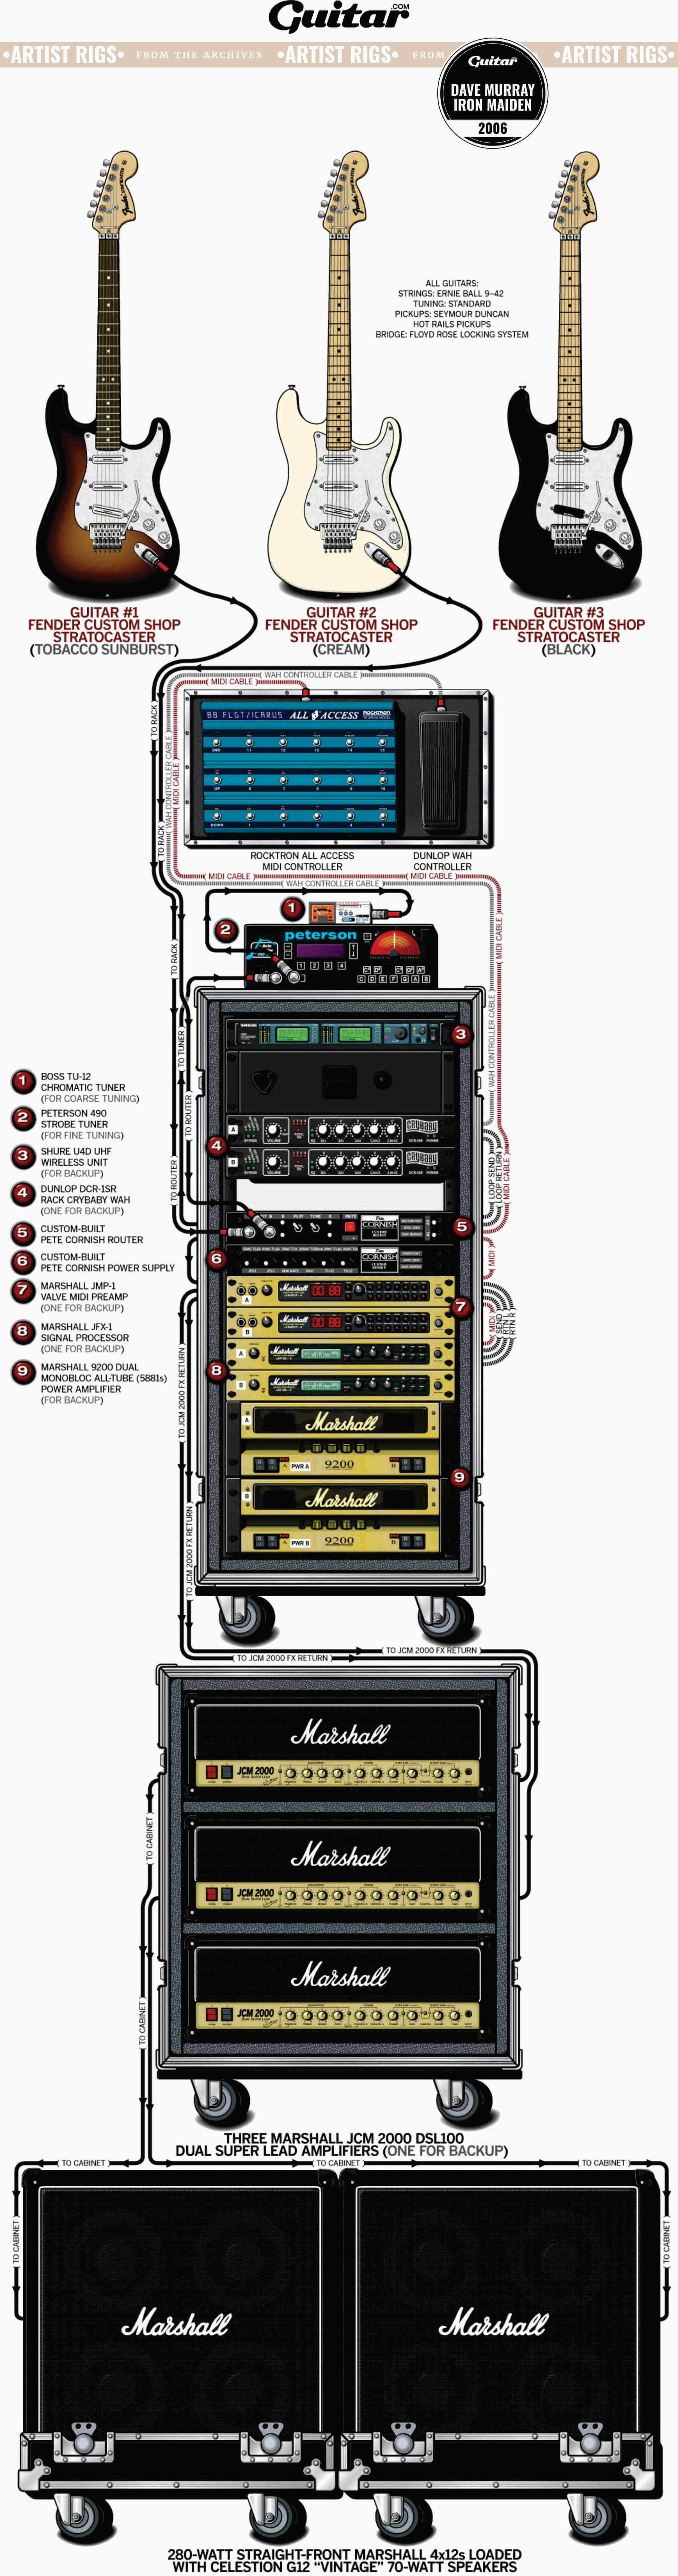 Rig Diagram: Dave Murray, Iron Maiden (2006)